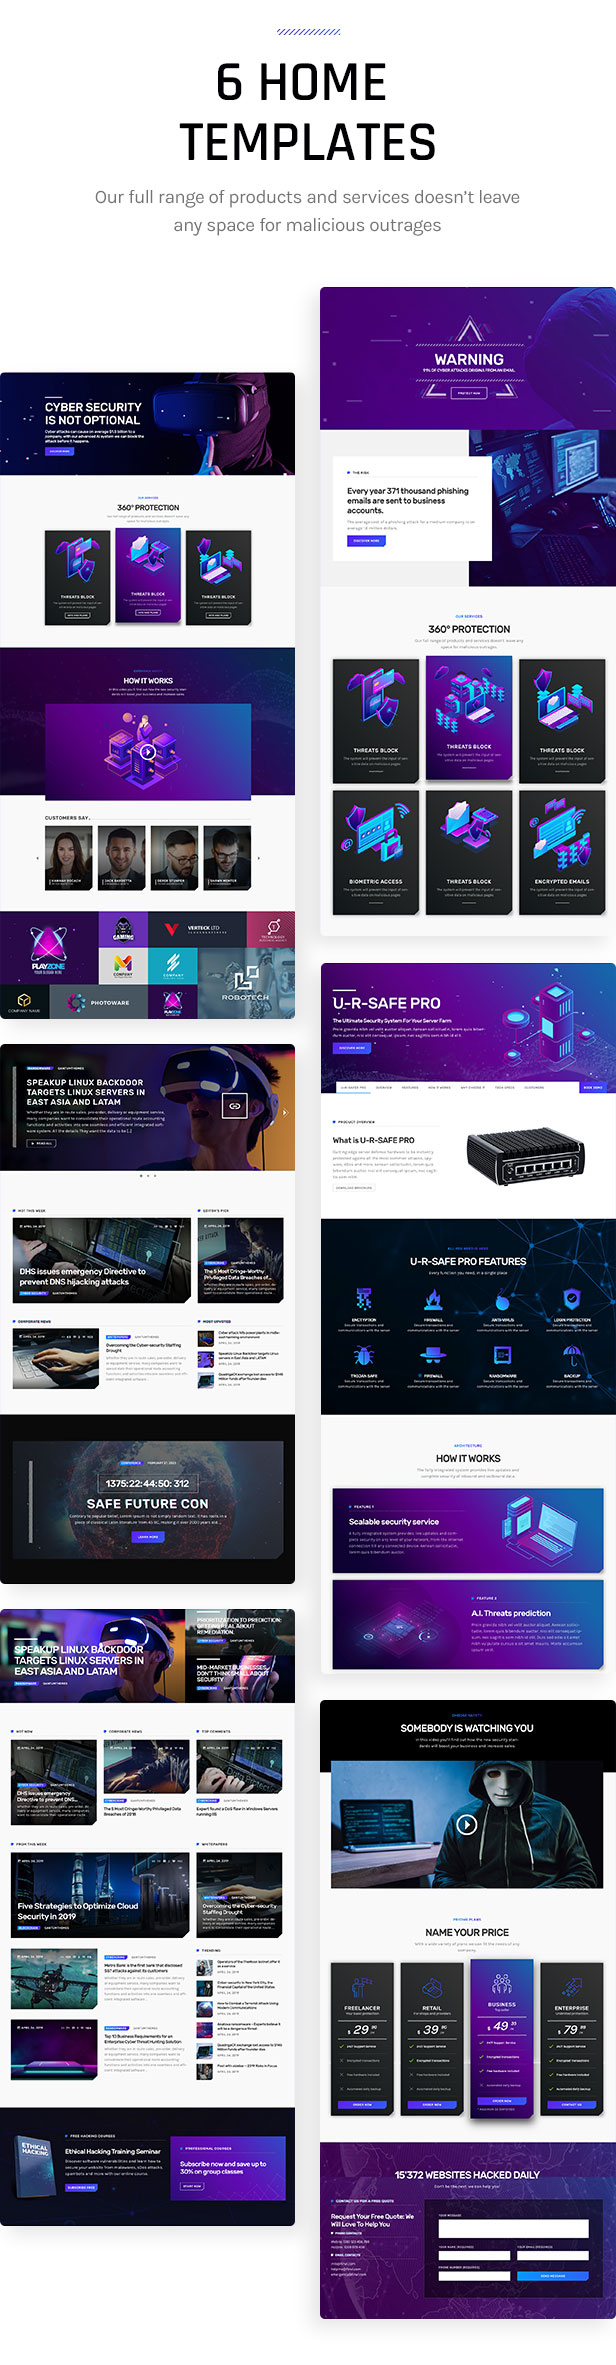 Firwl - Cyber Security WordPress Theme - 2